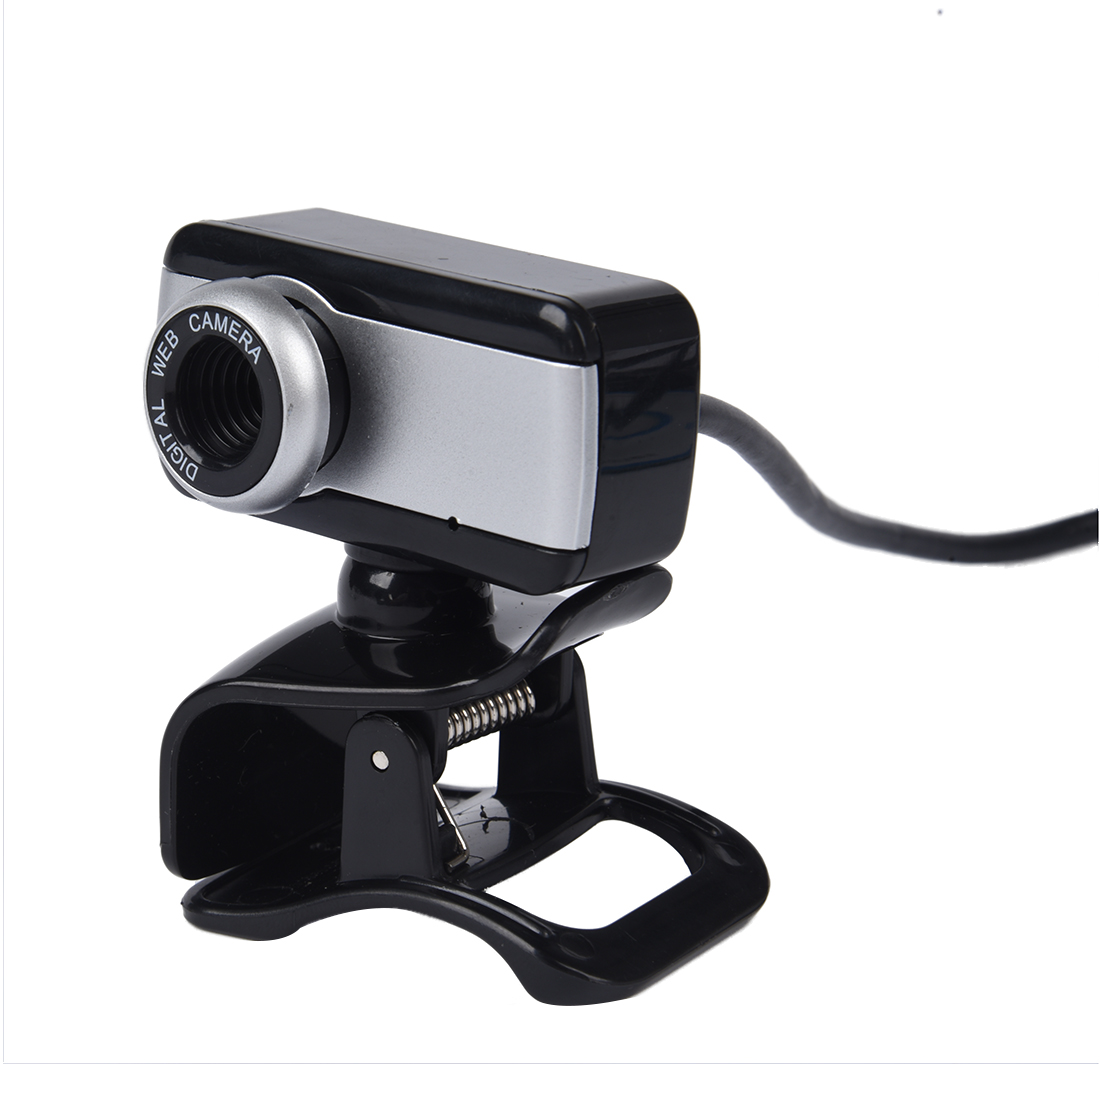 2x usb kamera webcam mit mic cd fuer pc laptop schwarz de ebay. Black Bedroom Furniture Sets. Home Design Ideas